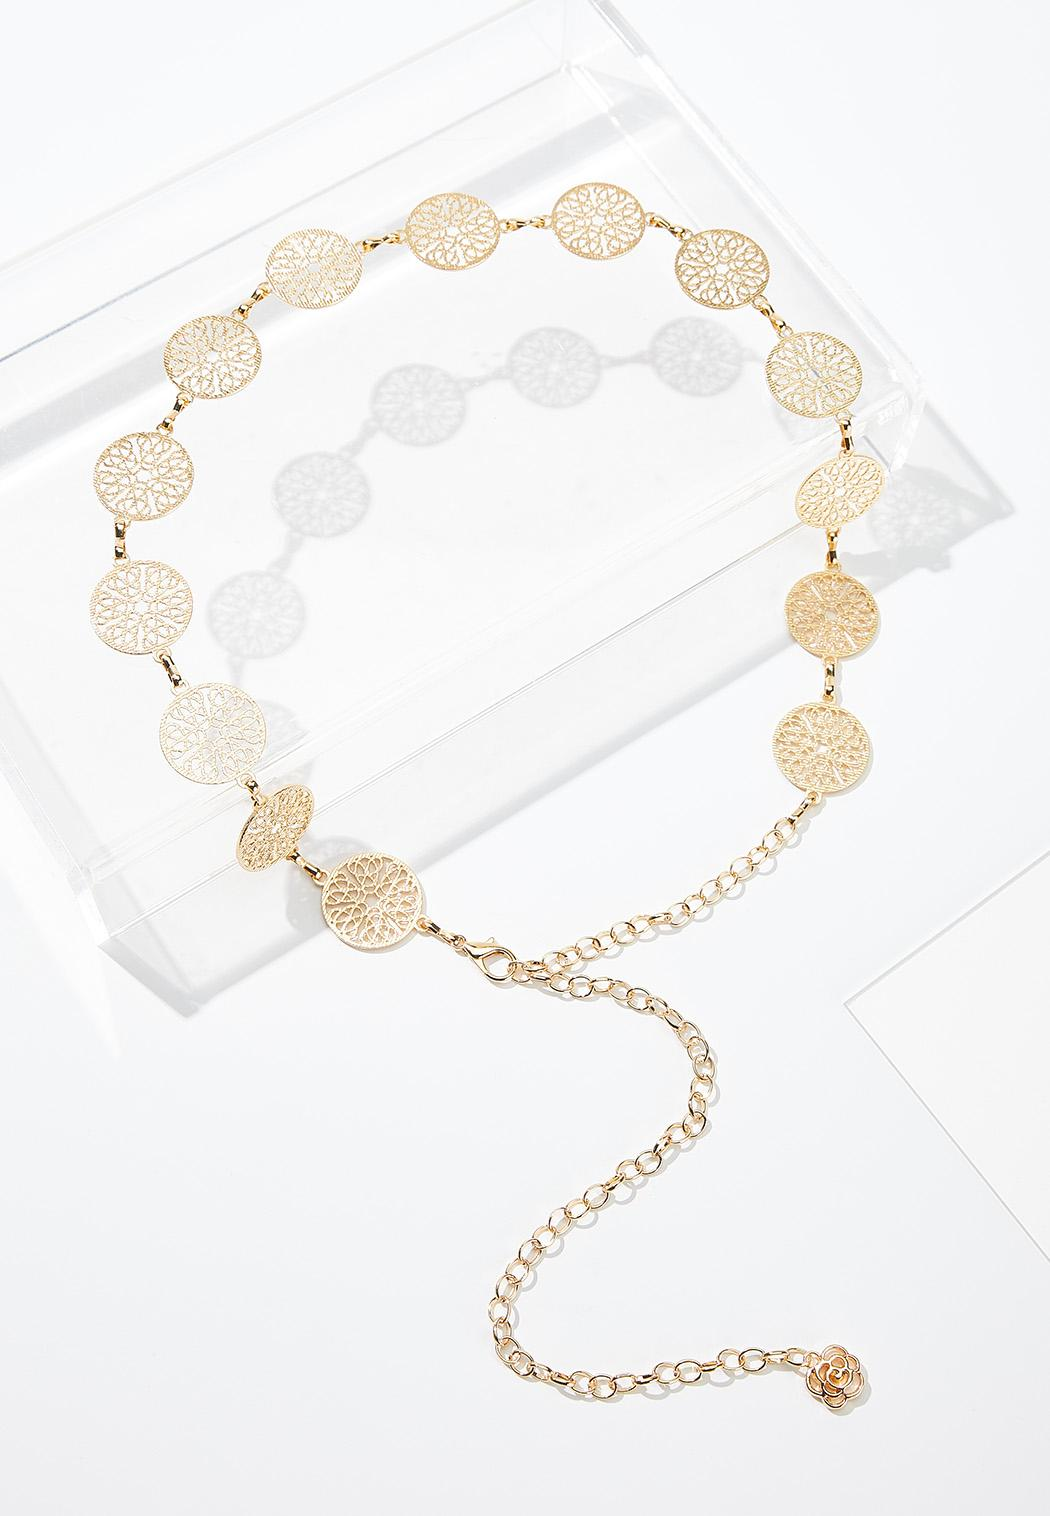 Plus Size Filigree Gold Chain Belt